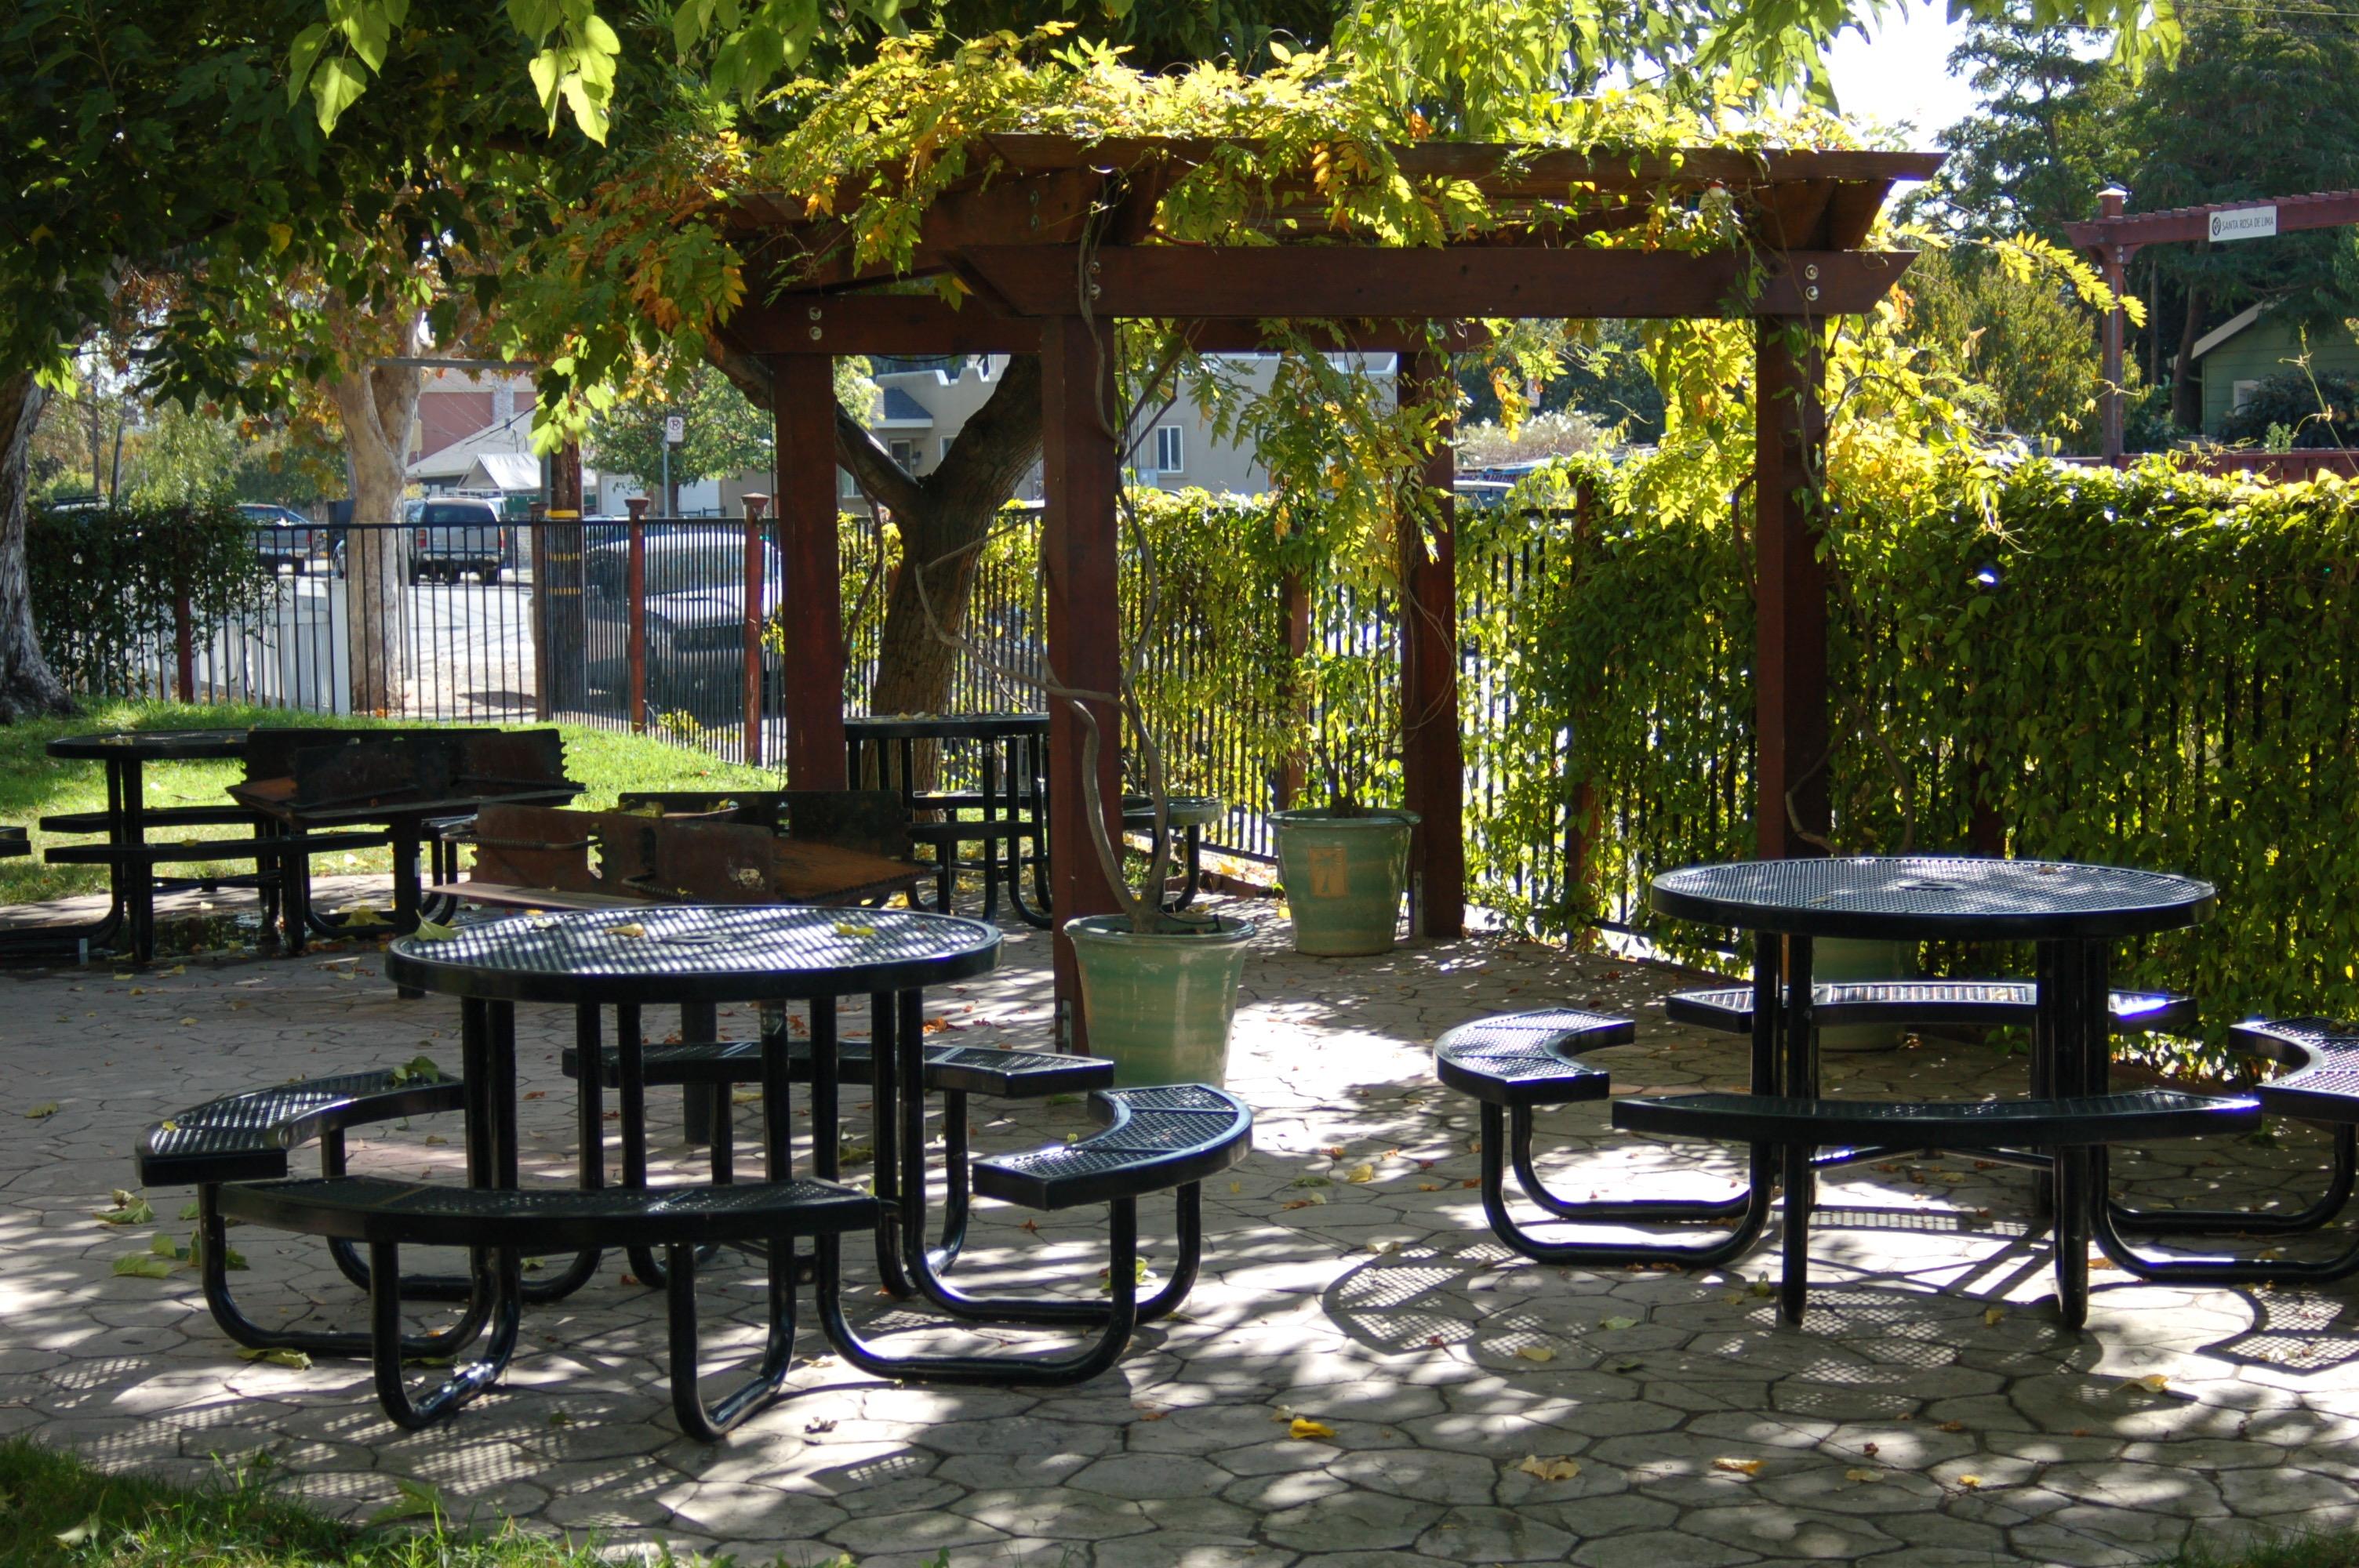 st-clares-apartments-patio-tables-st-francis-center